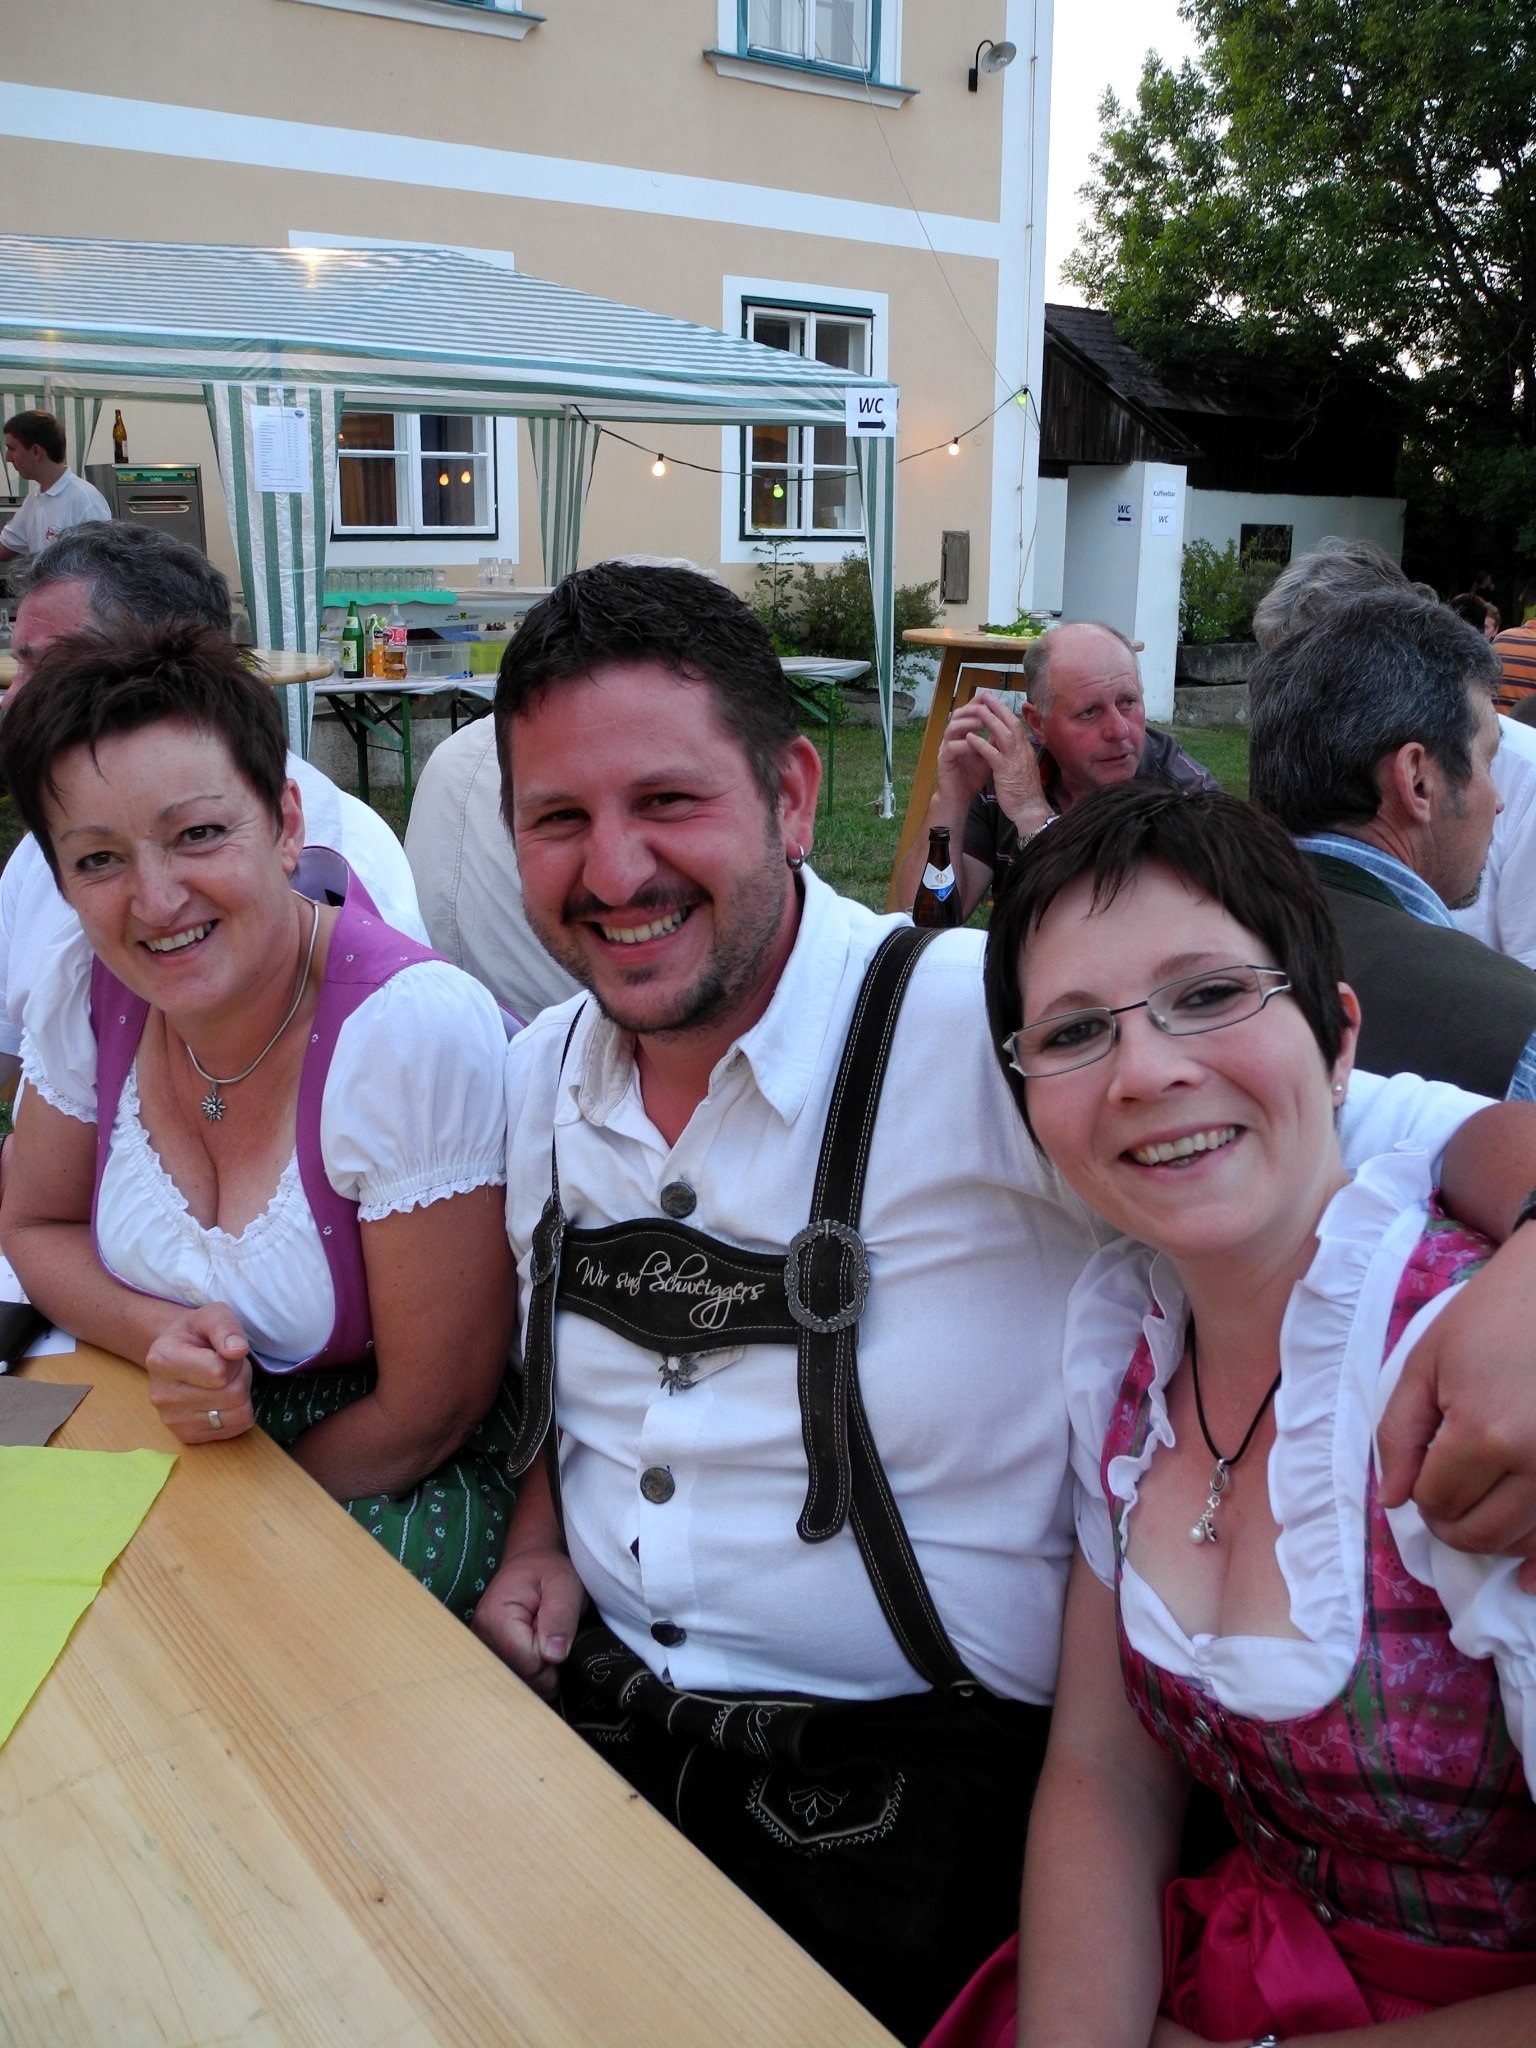 Kostenlose singlebrse in eggenberg, Schweiggers dating